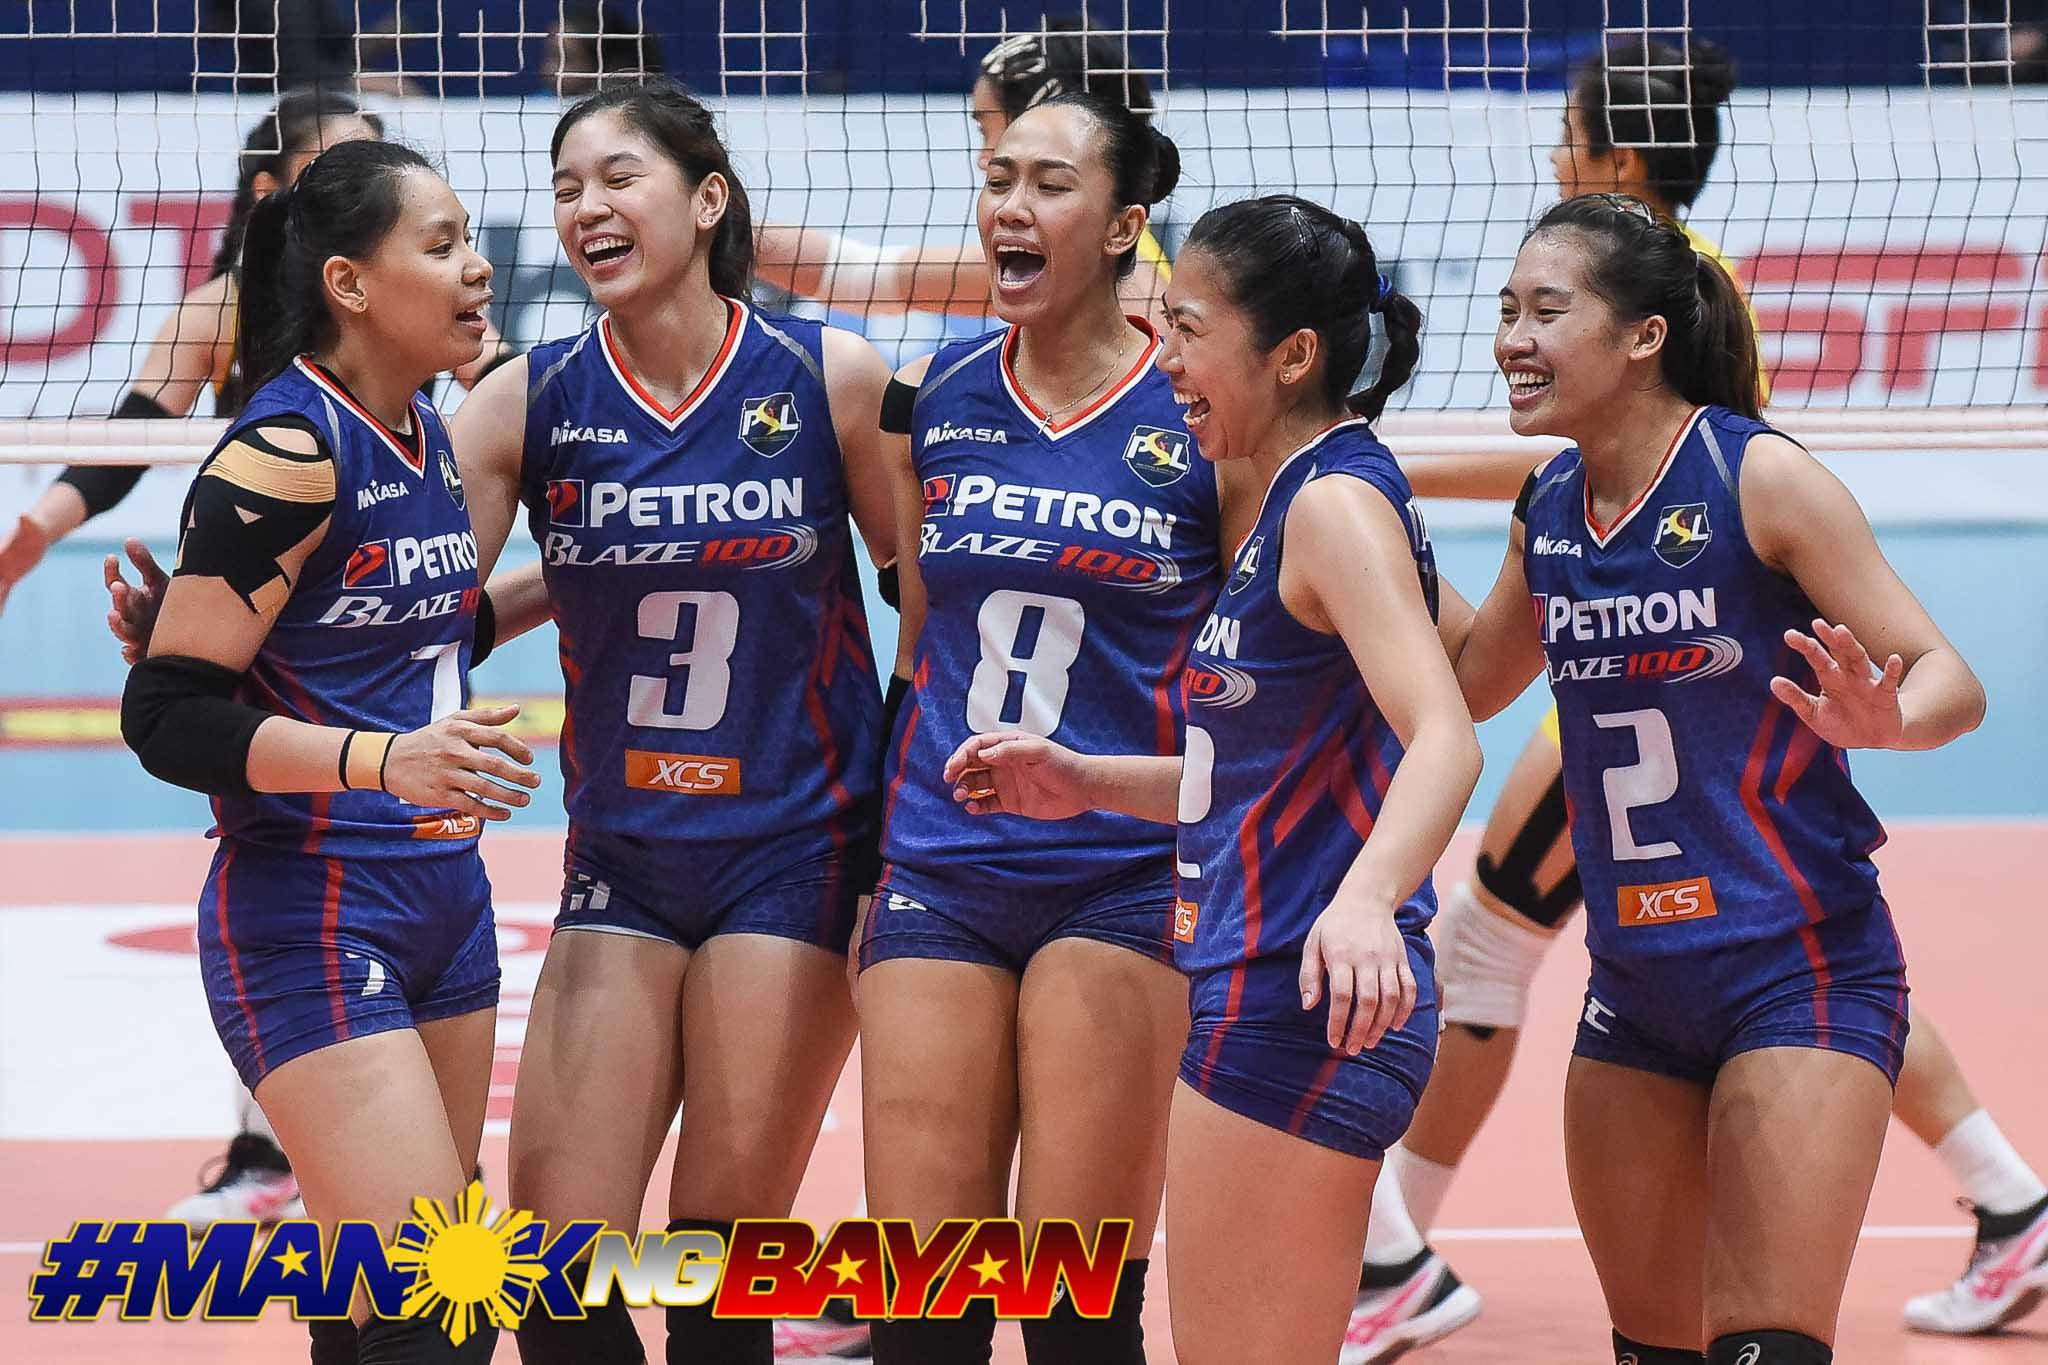 PSL-AFC-Finals-G3-F2-vs.-Petron-Maizo-Pontillas-0243 Mika Reyes marvels at PVL lineup: 'Sobrang exciting yung liga na 'to' News PVL Volleyball  - philippine sports news